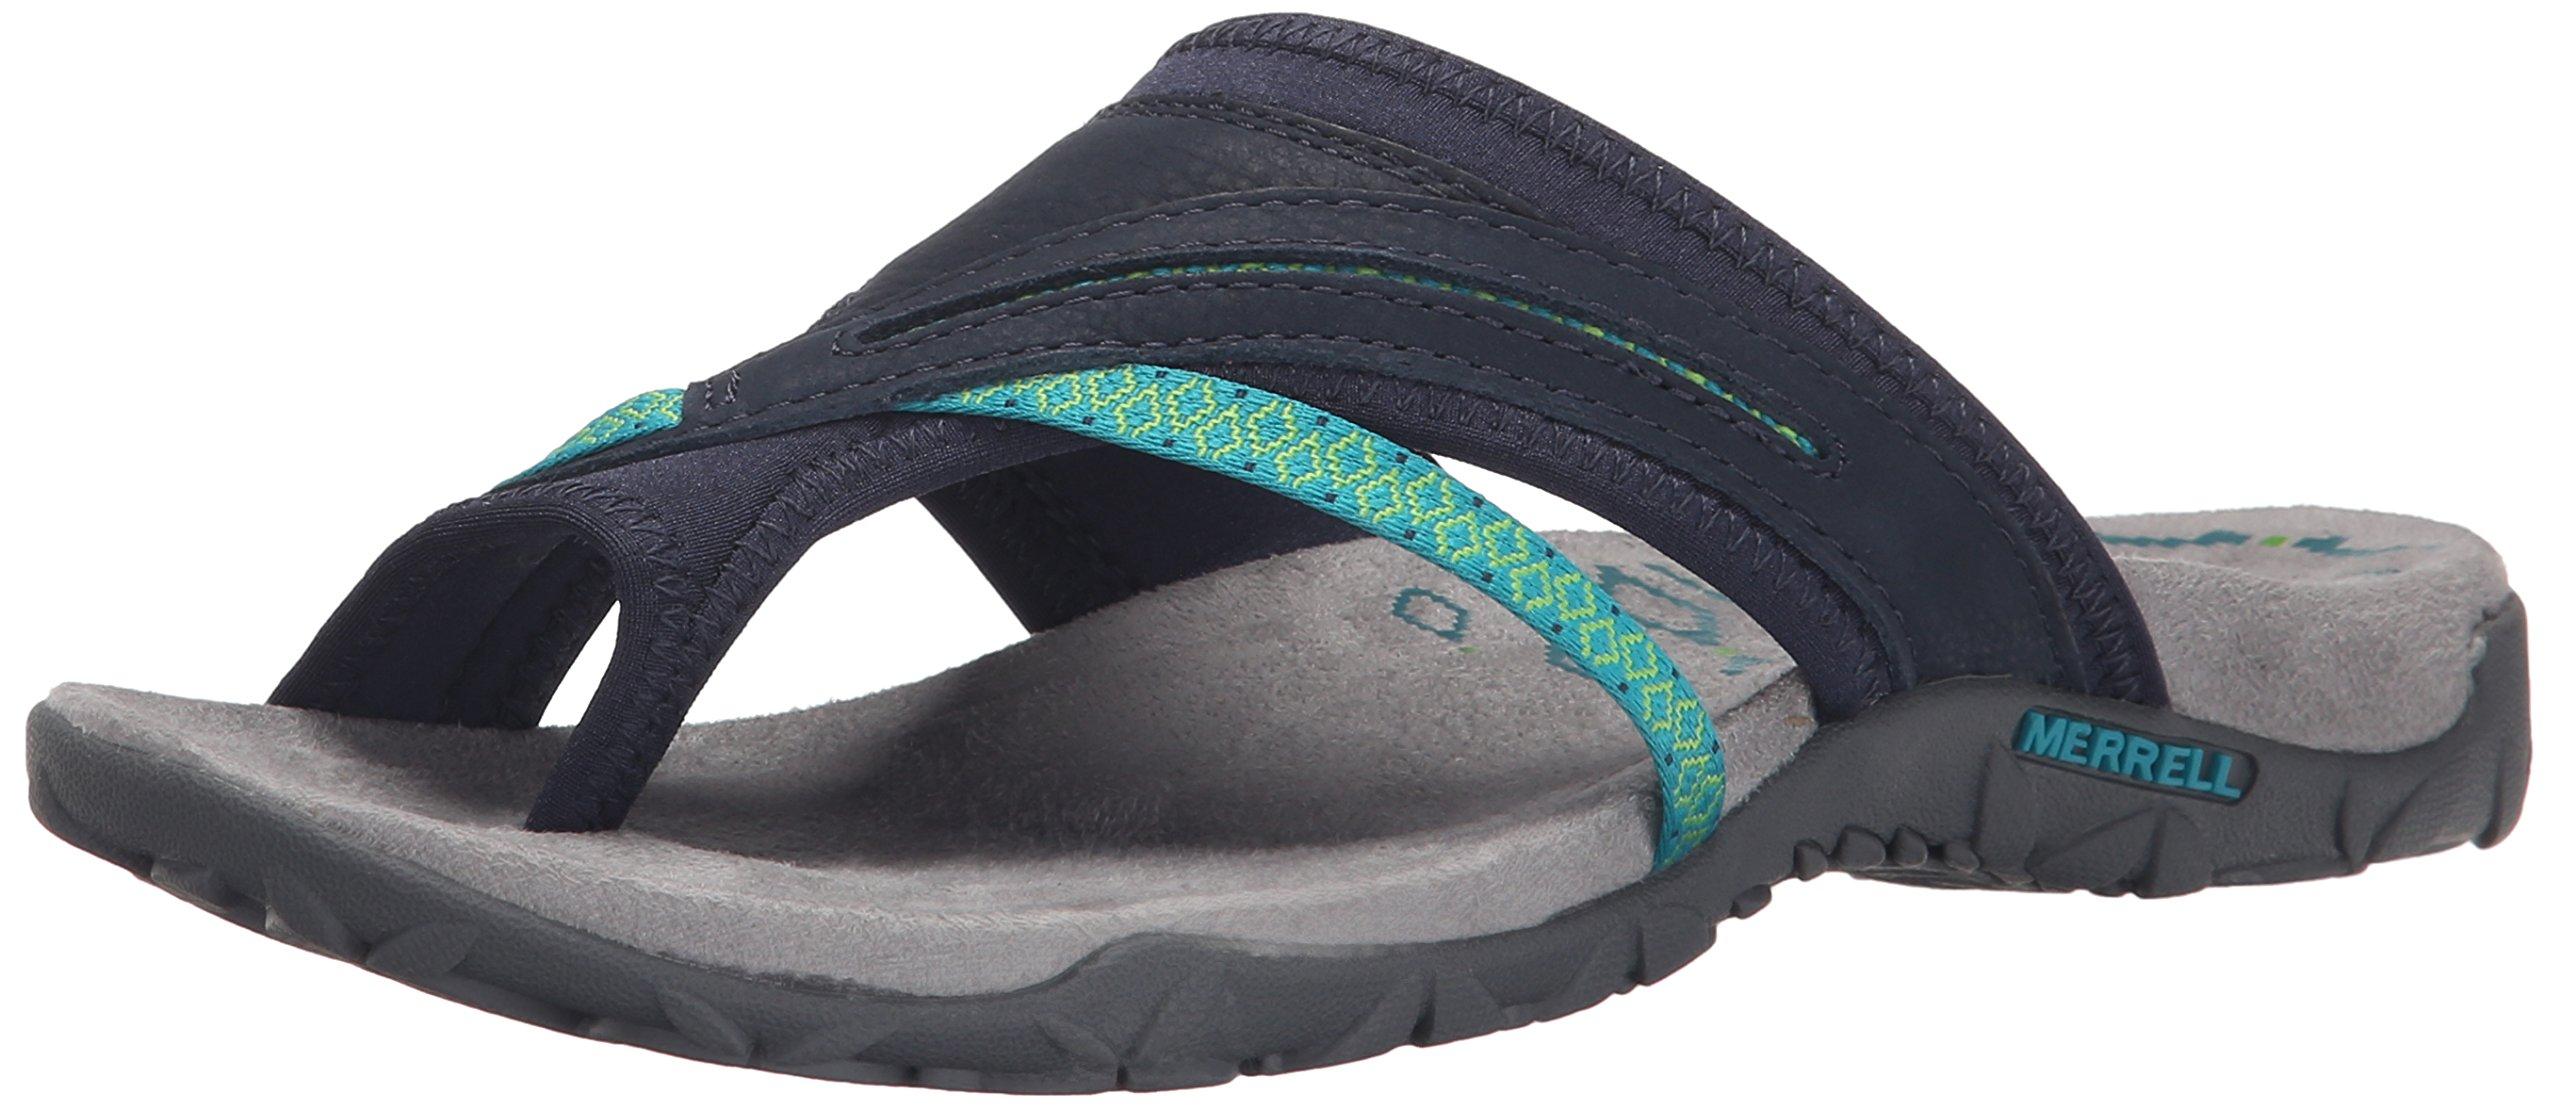 Merrell Women's Terran Post II Sandal, Navy, 9 B(M) US